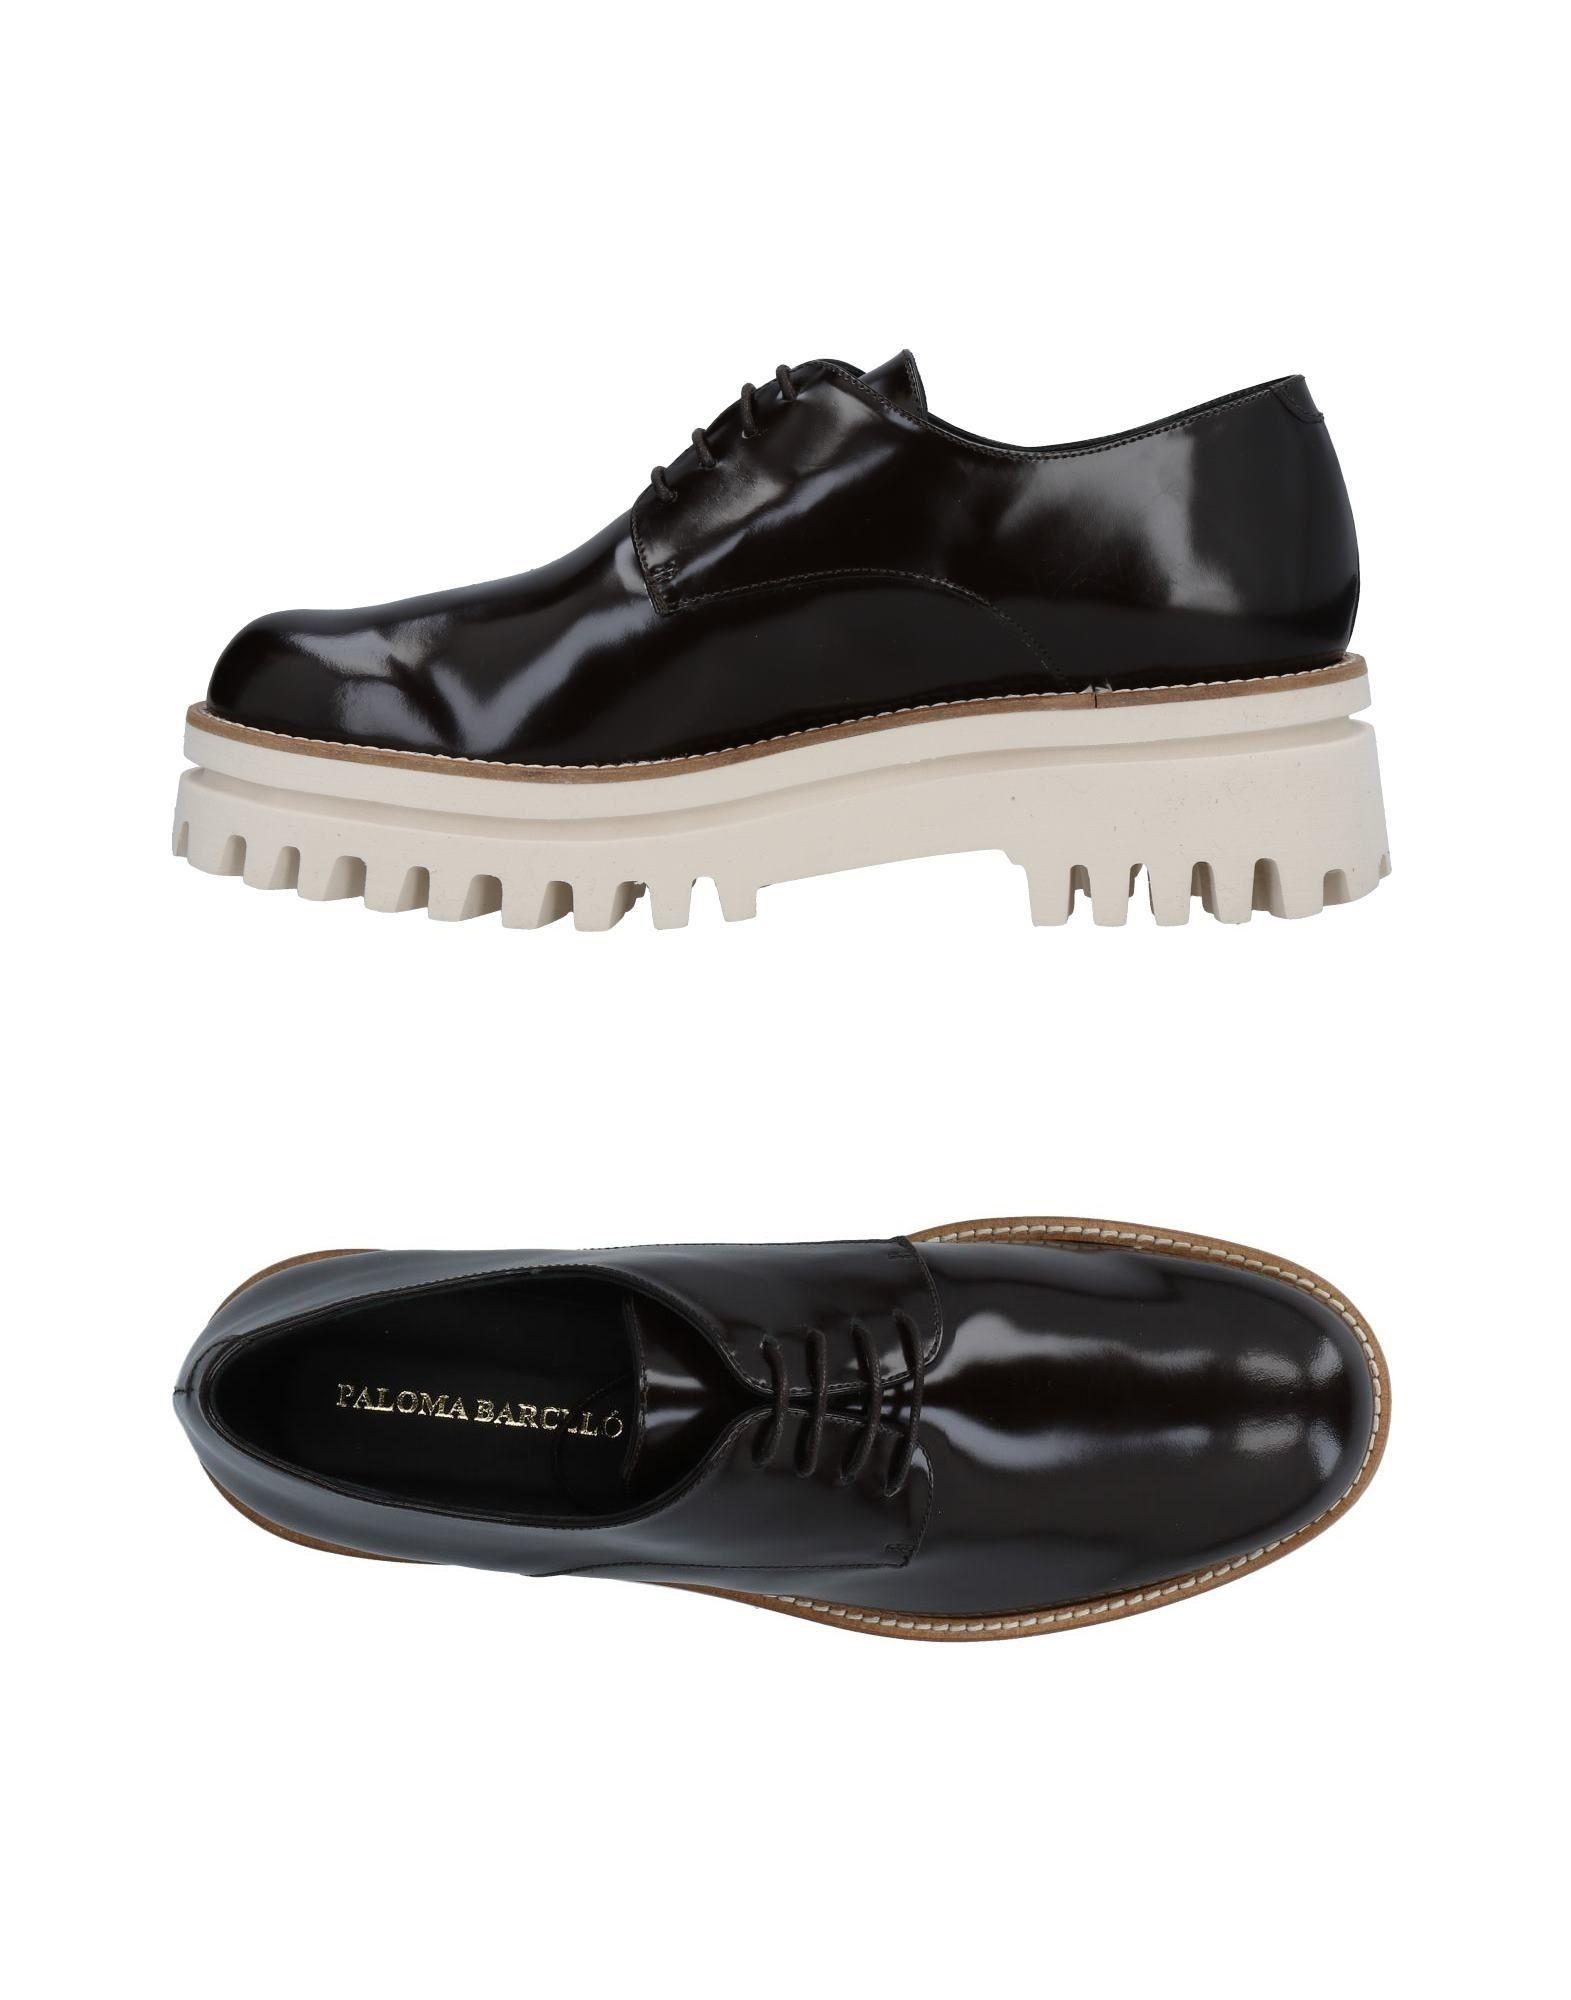 Gut um billige Schuhe zu  tragenPaloma Barceló Schnürschuhe Damen  zu 11481225DL 40553c